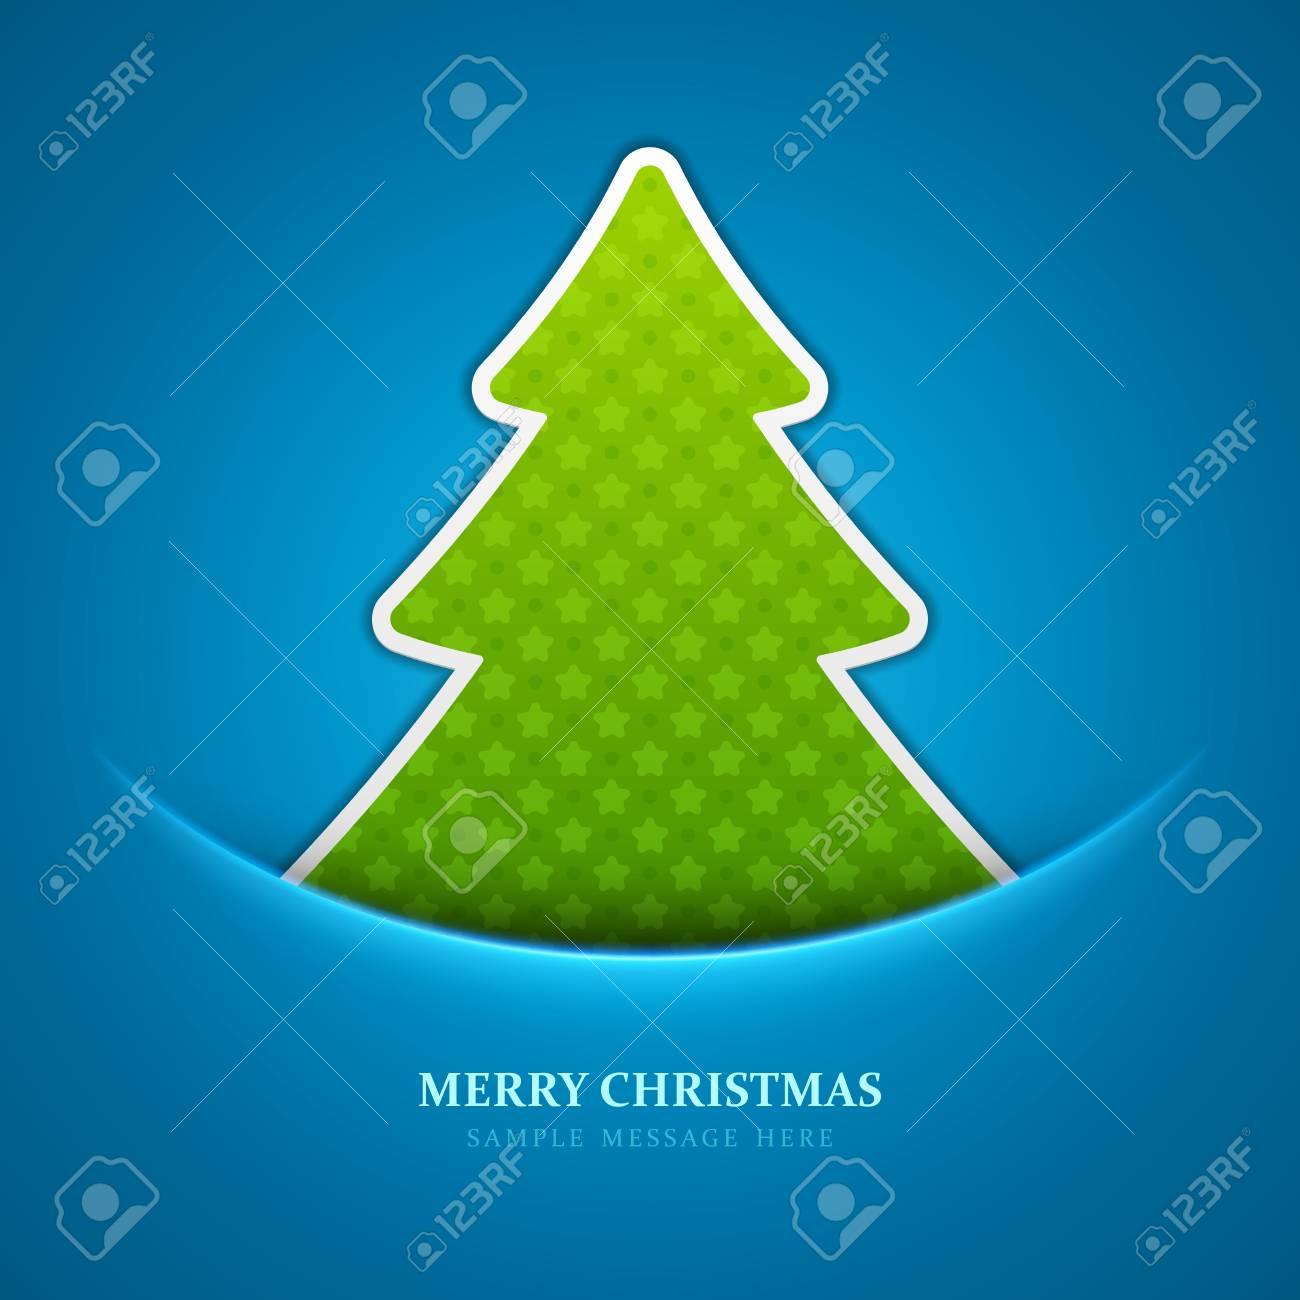 Christmas tree background Stock Vector - 15828403